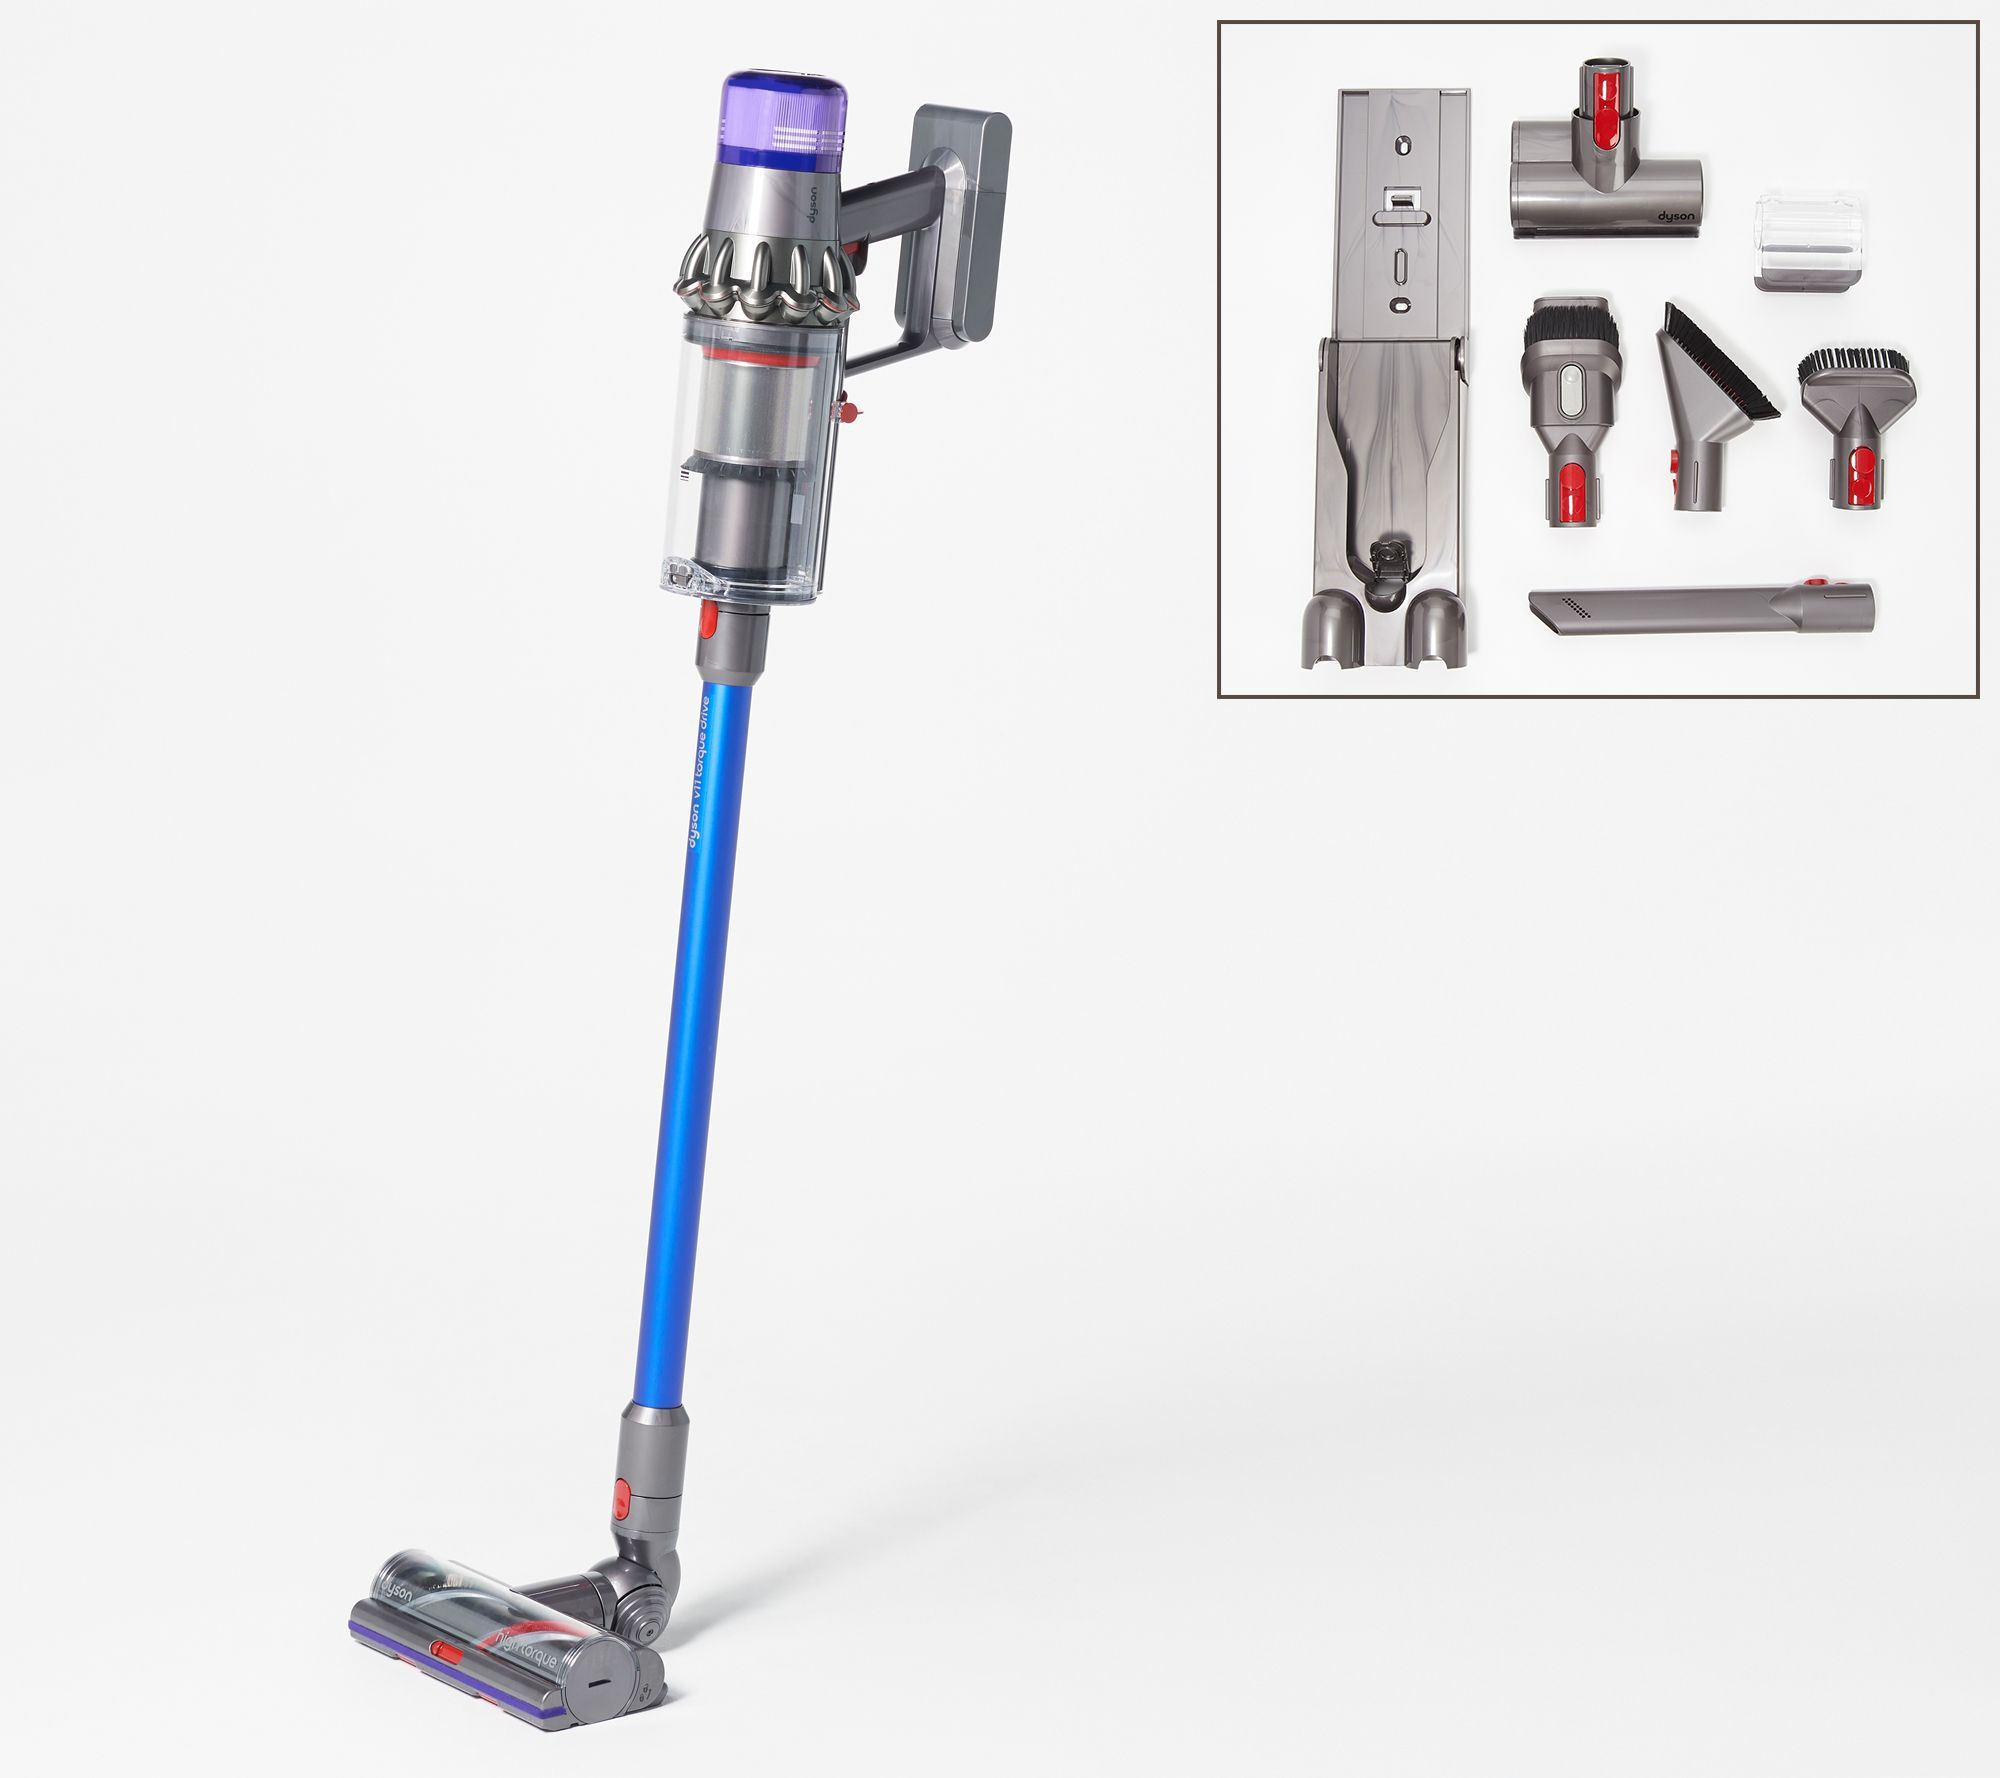 Dyson V11 Torque Drive Cordfree Vacuum with 5 Tools — QVC